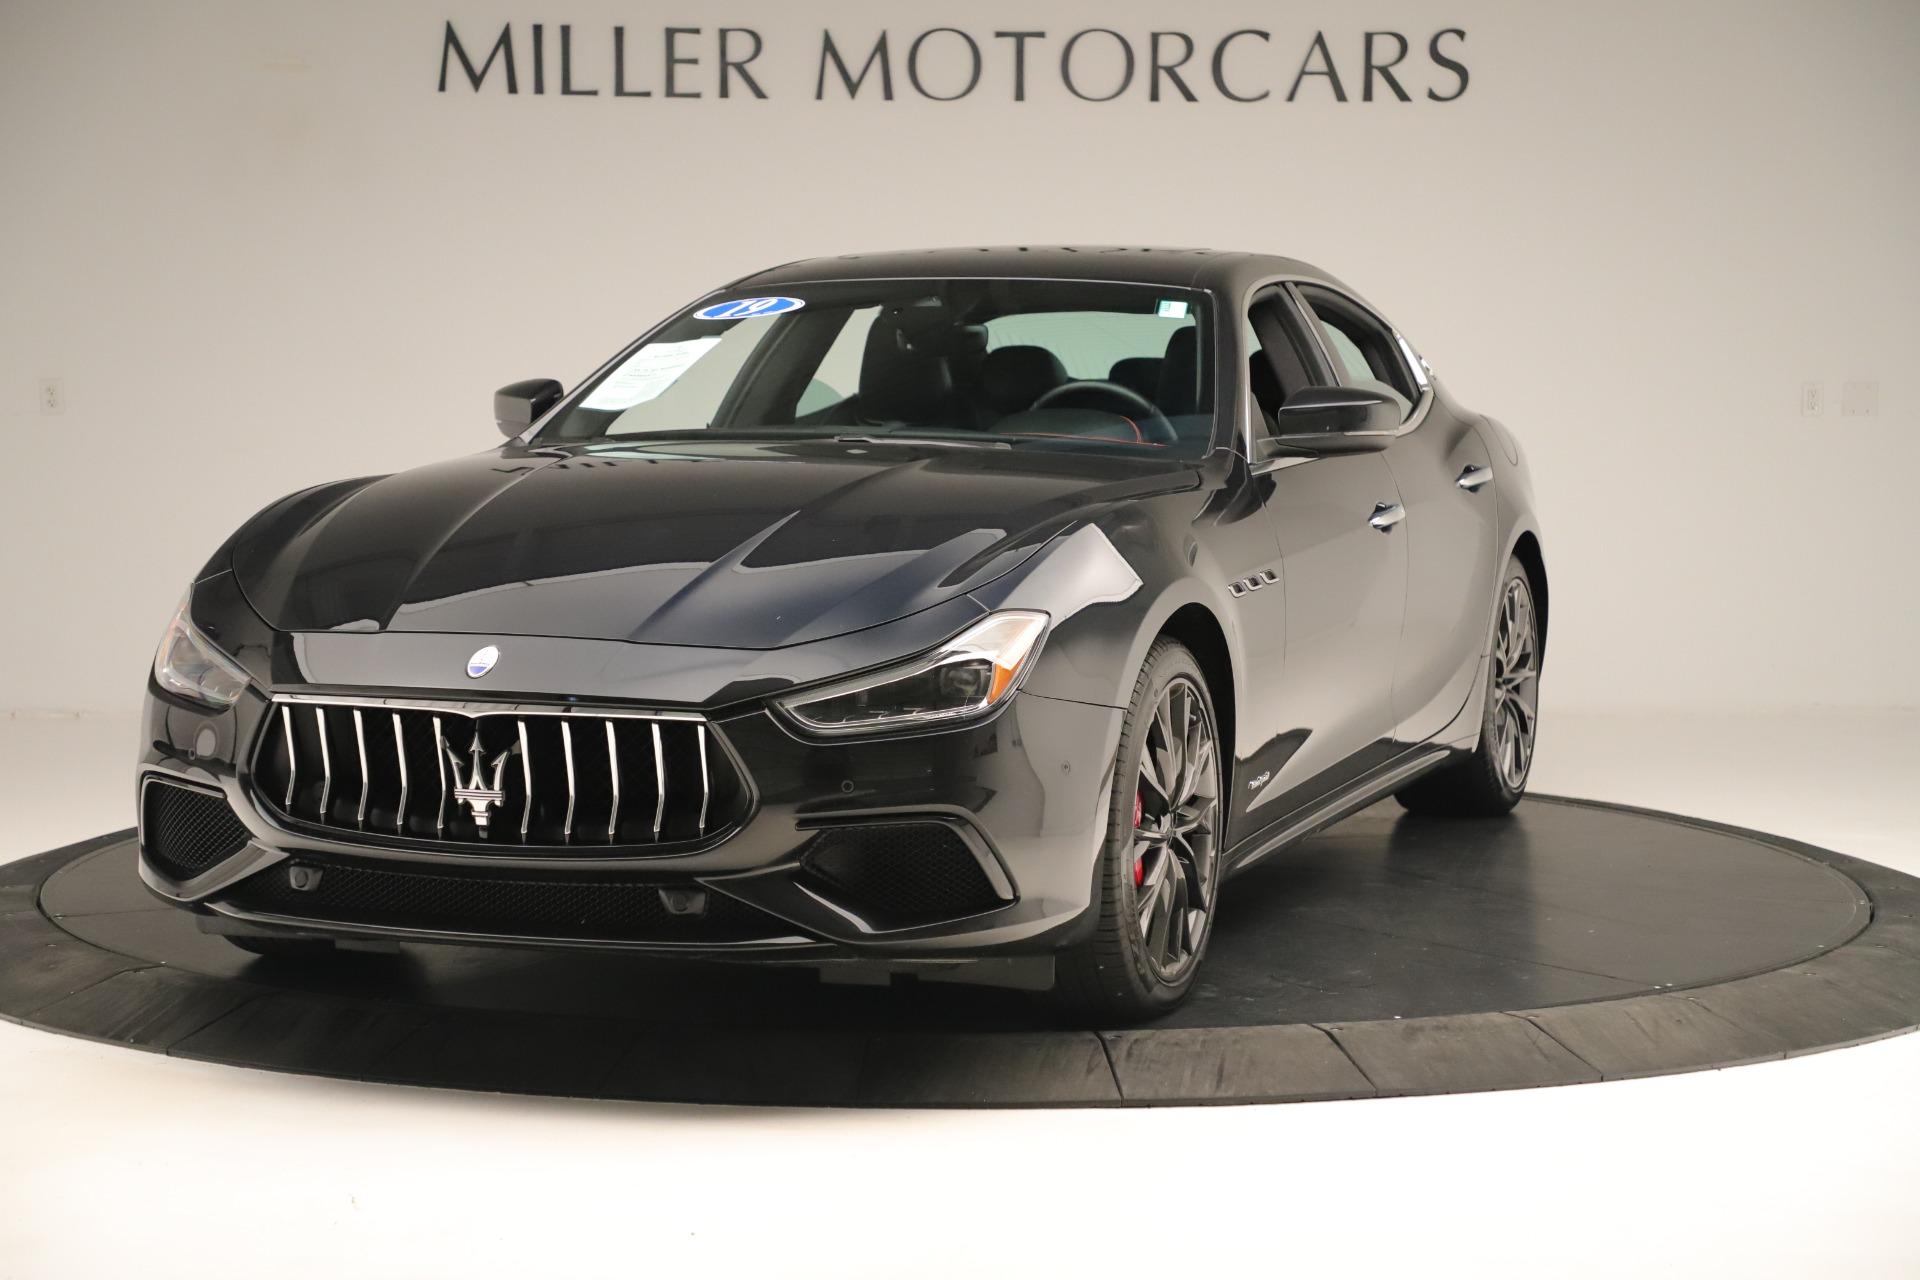 New 2019 Maserati Ghibli S Q4 GranSport For Sale In Greenwich, CT 2640_main